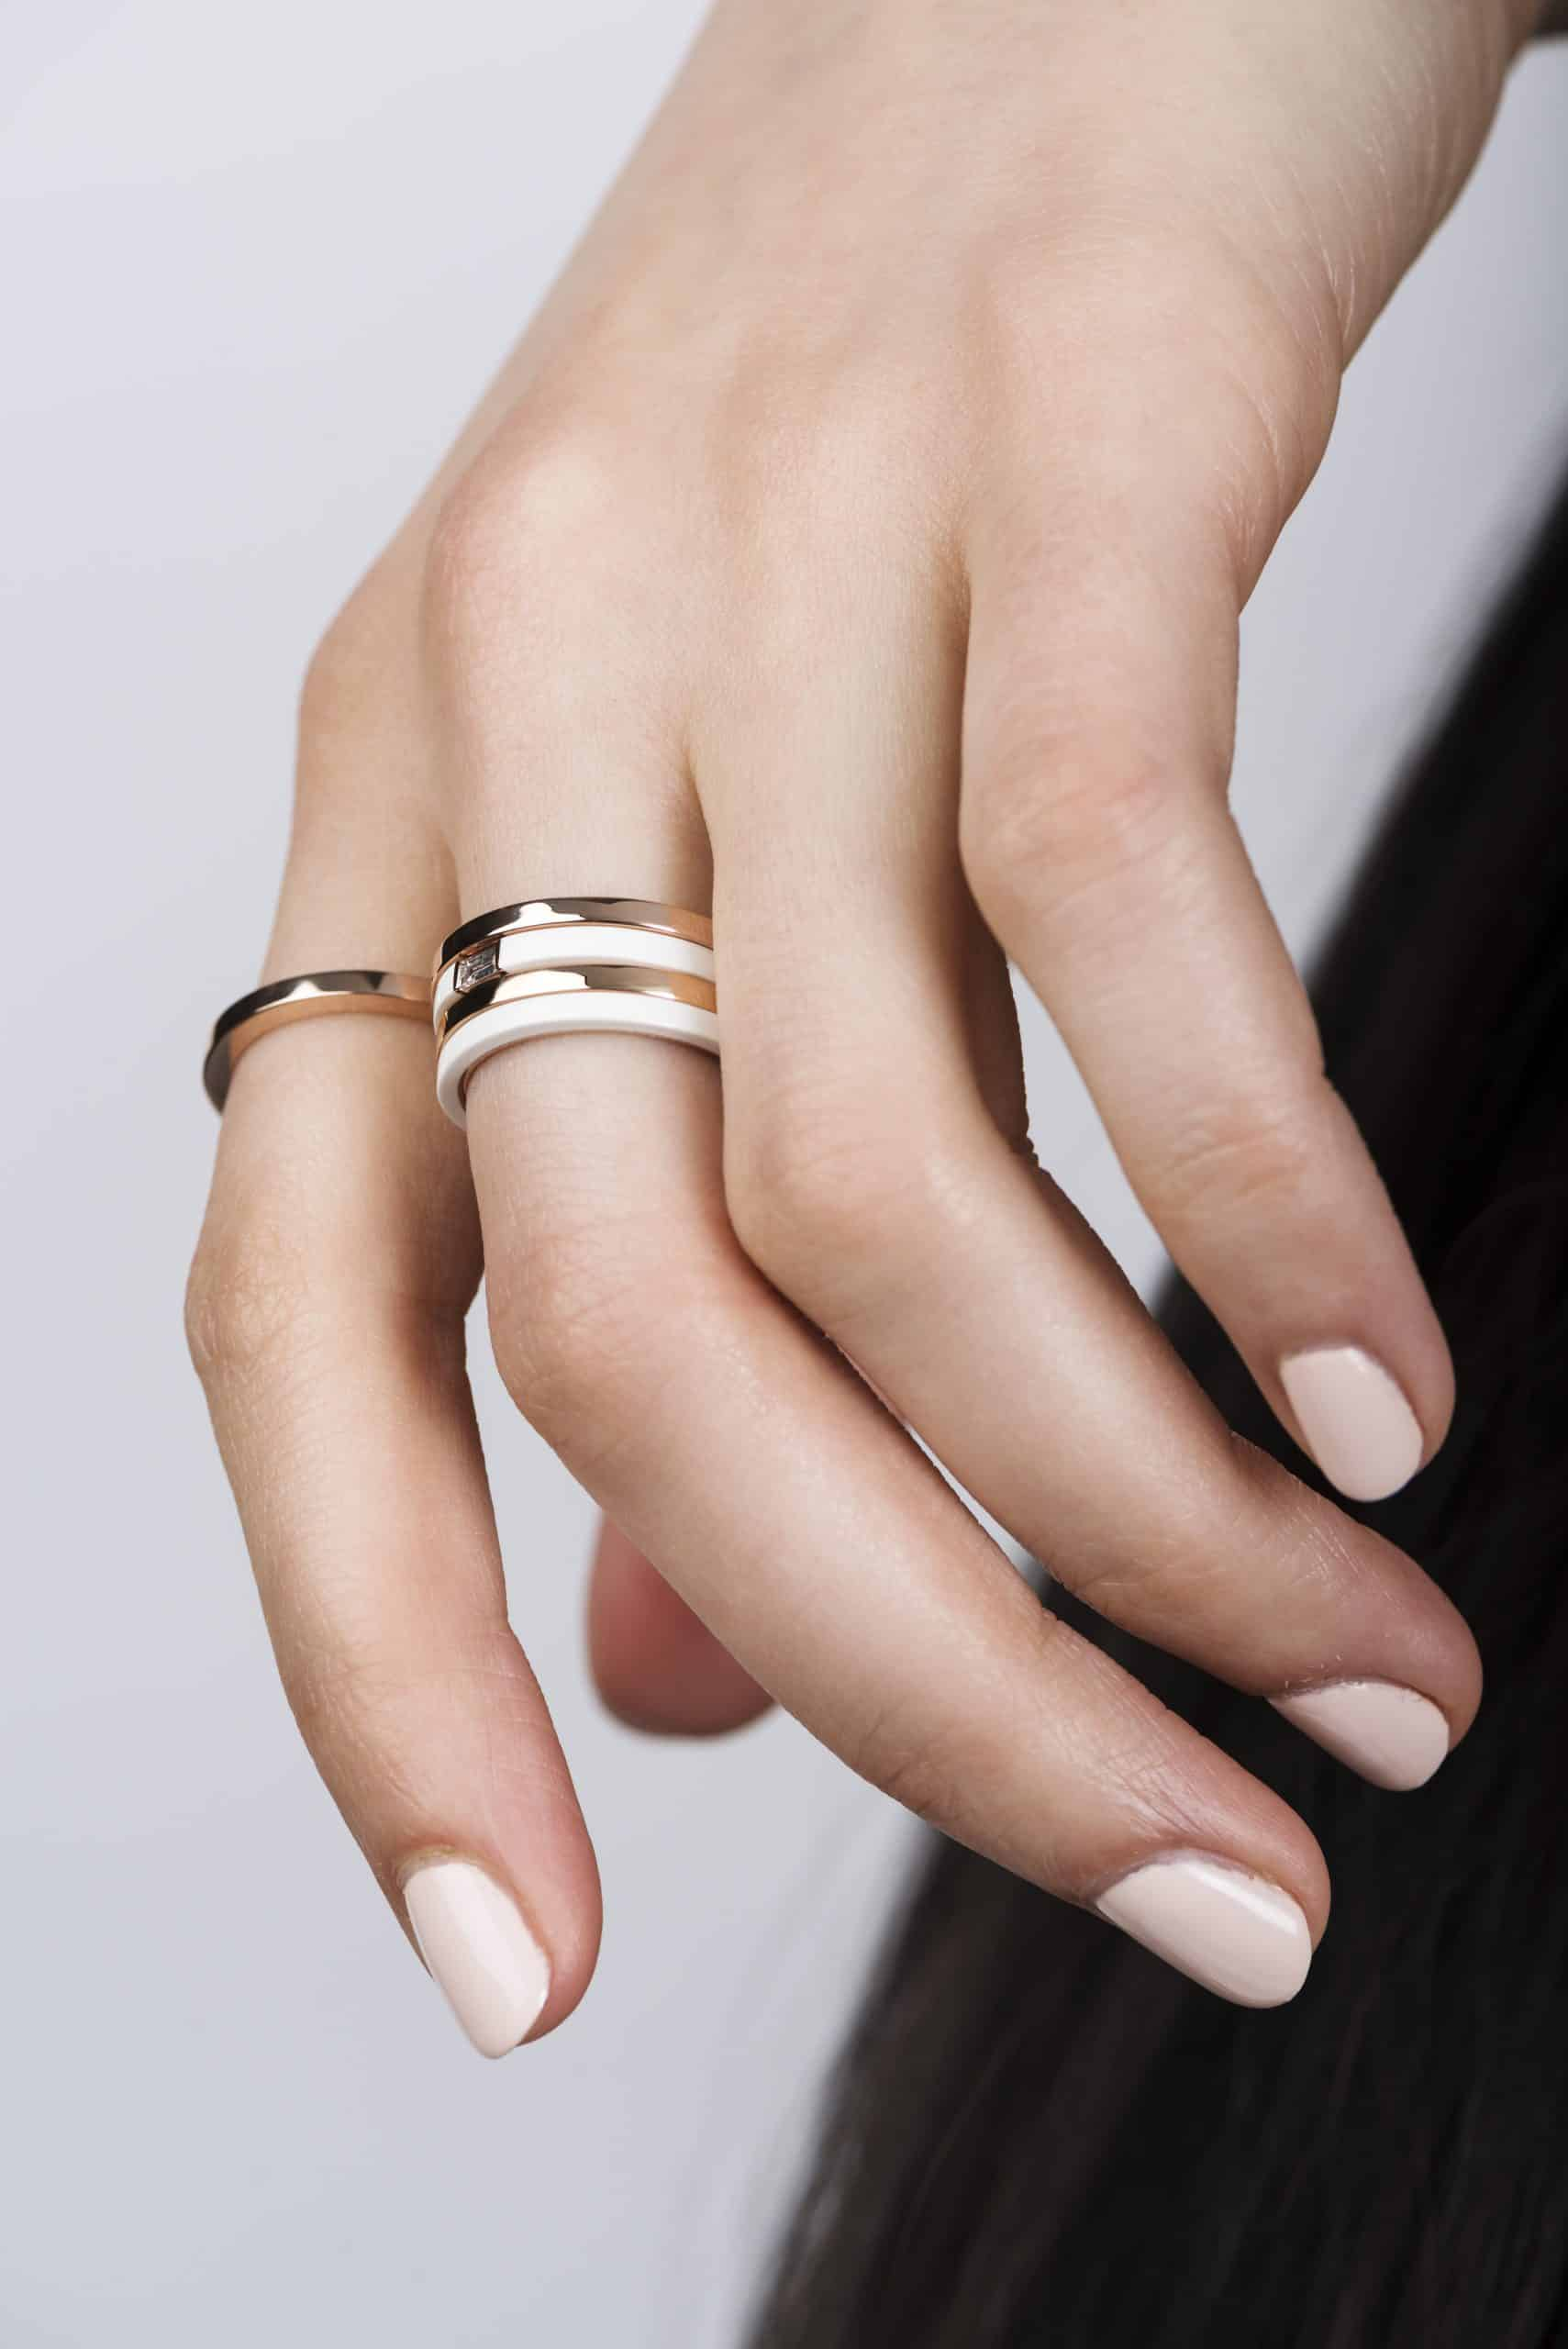 Canadian brand Hestia Jewels sets sights on UK market